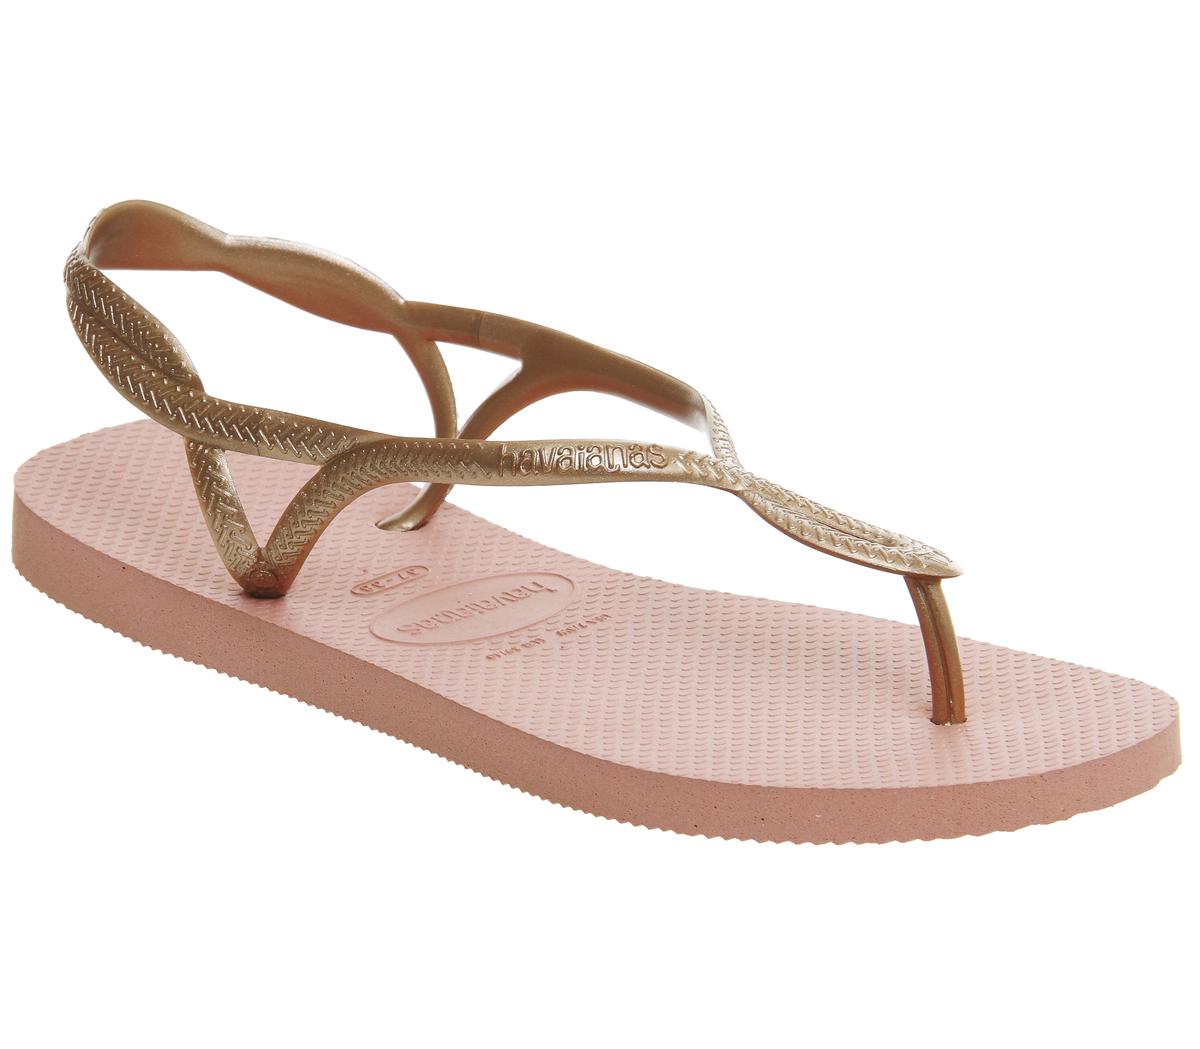 082b966ff Sentinel Womens Havaianas Luna Flip Flops LIGHT ROSE Sandals